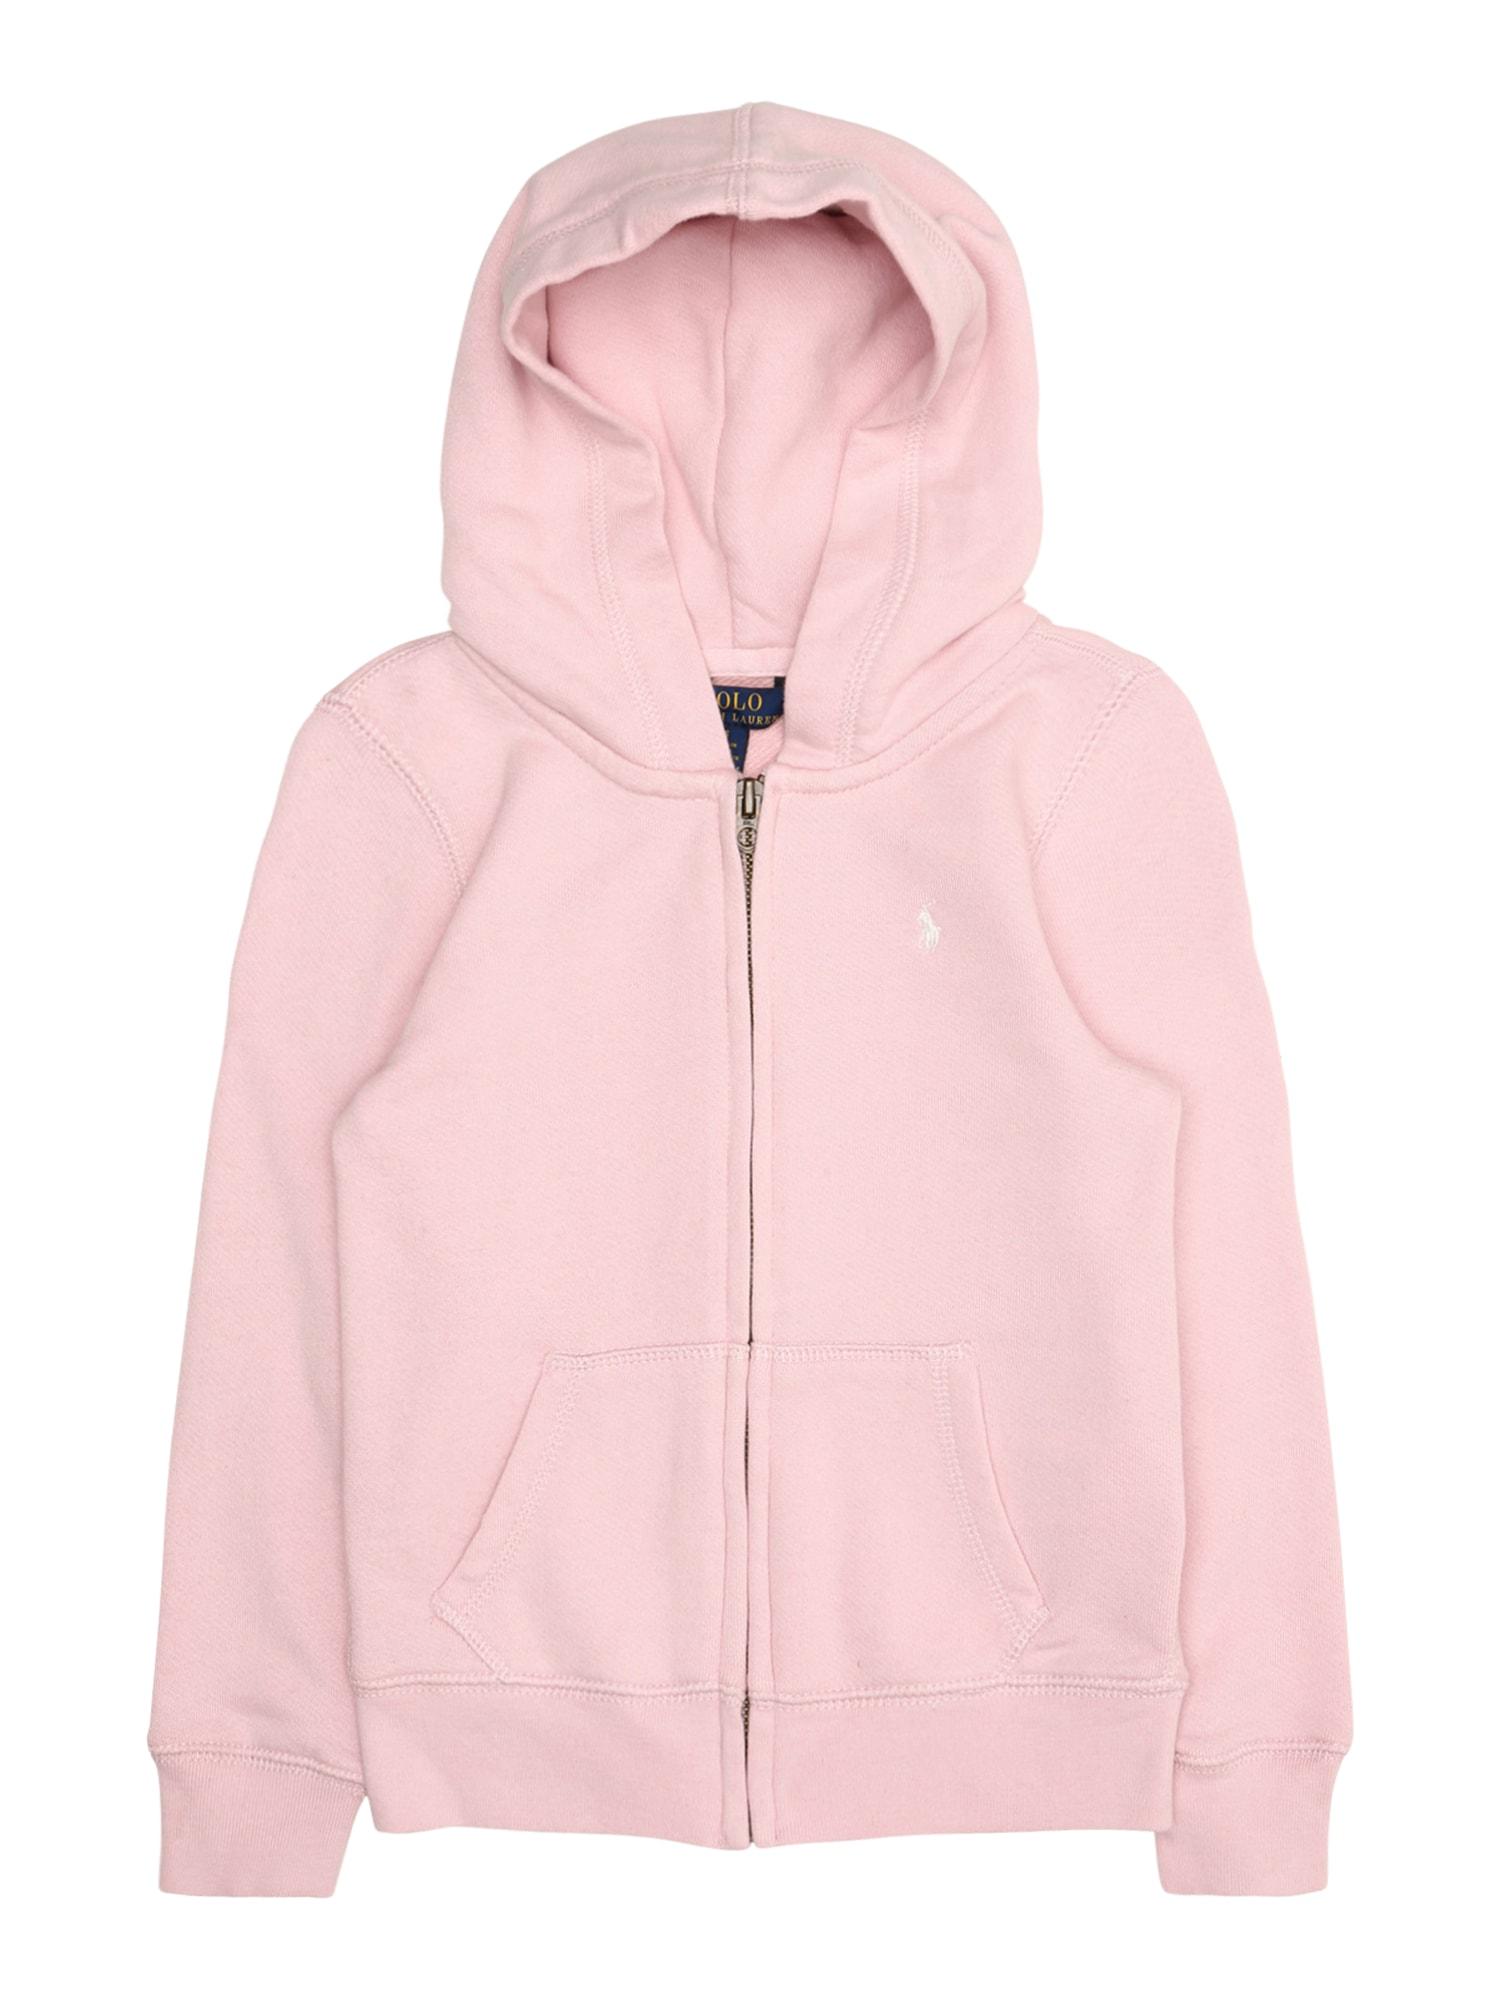 POLO RALPH LAUREN Mikina s kapucí  pink